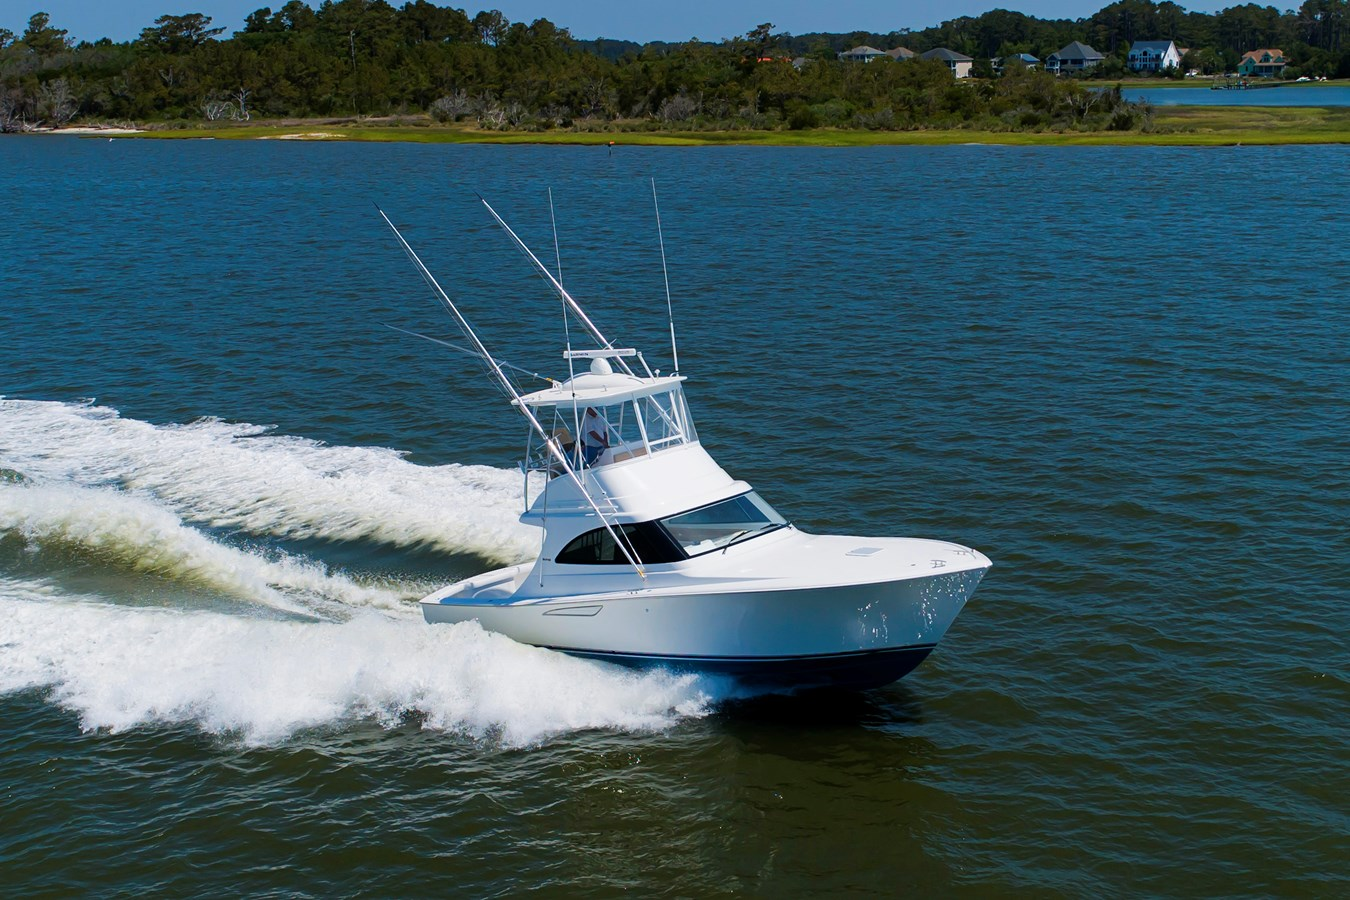 Viking 38 Billfish Running - 38 VIKING For Sale